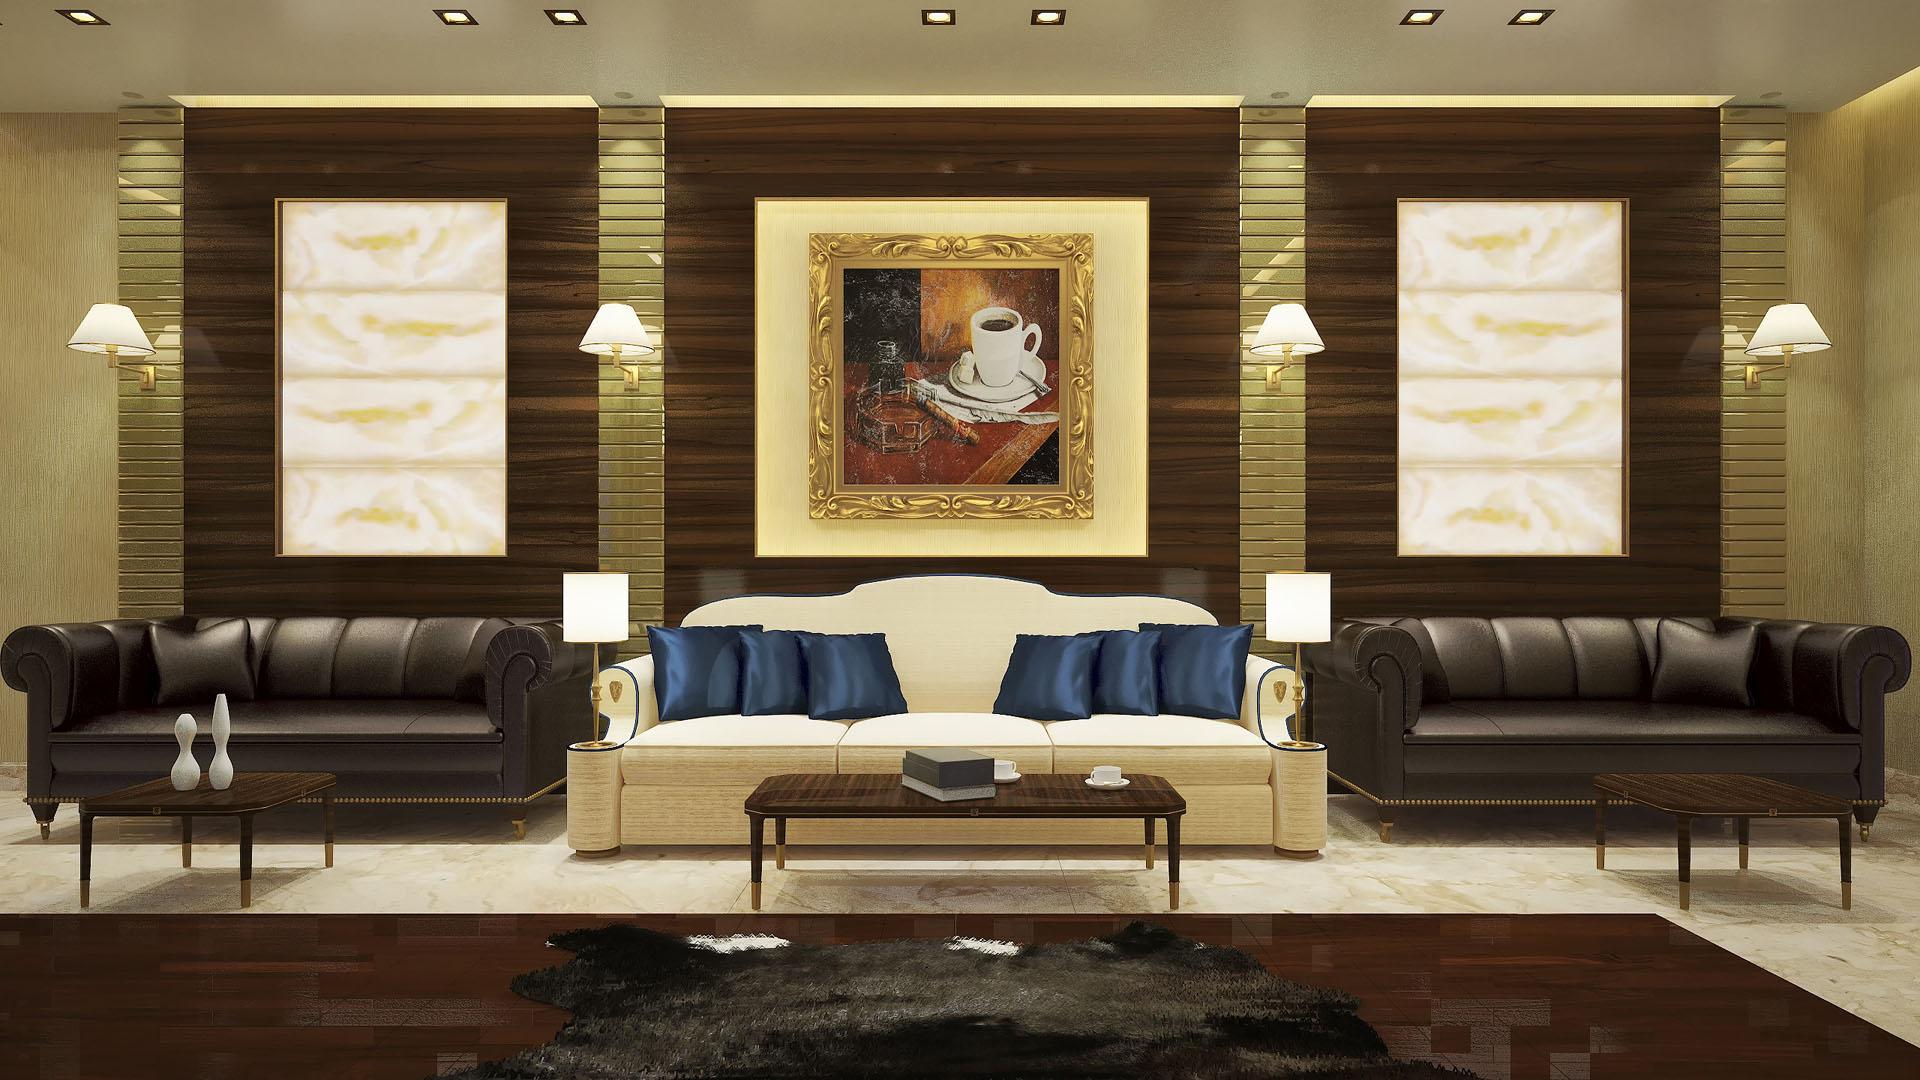 Residentials verona interiors - Interior design verona ...